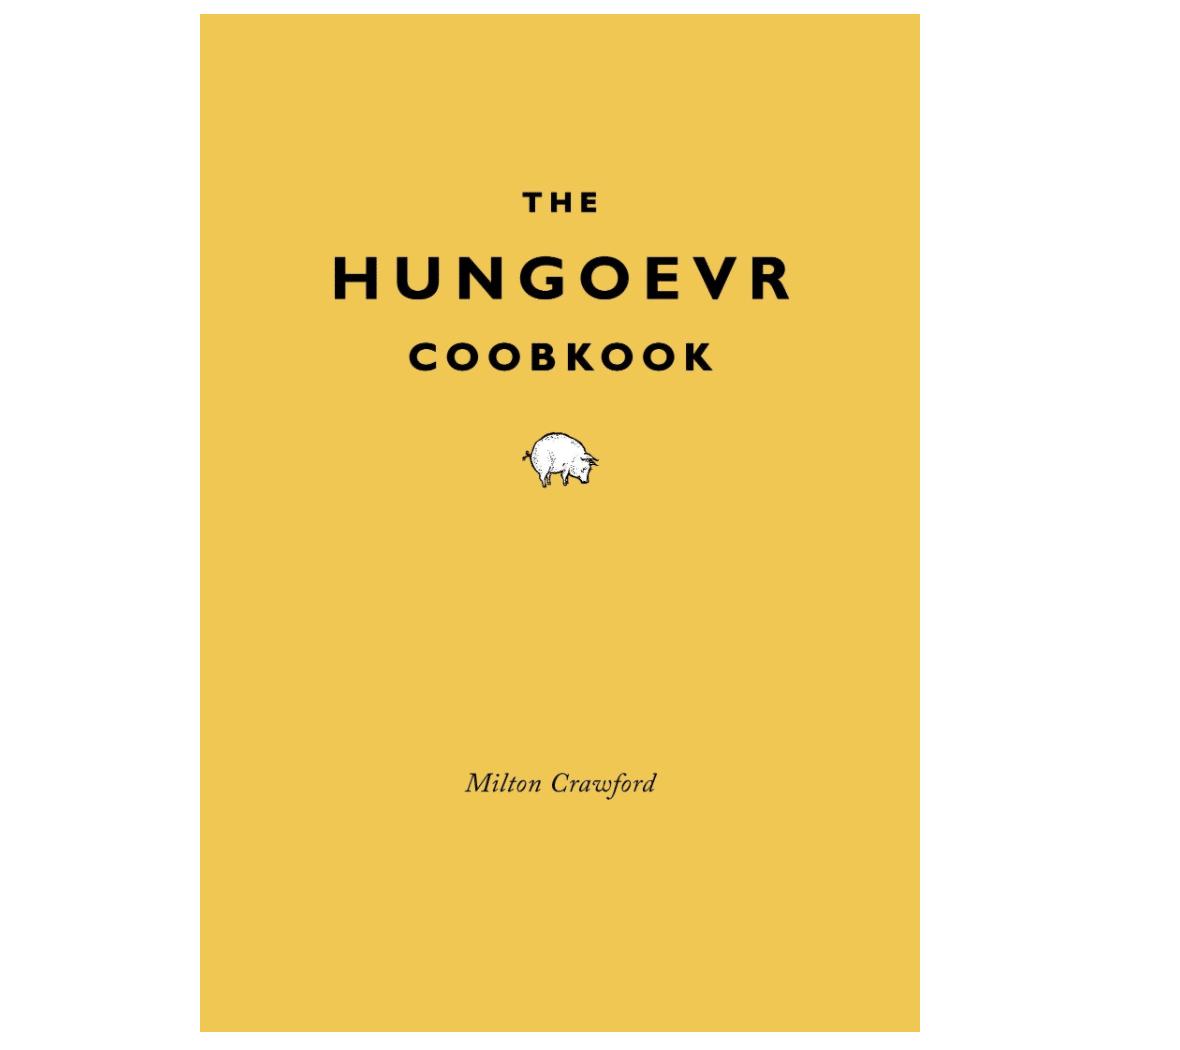 21st-birthday-gift-ideas-cookbook